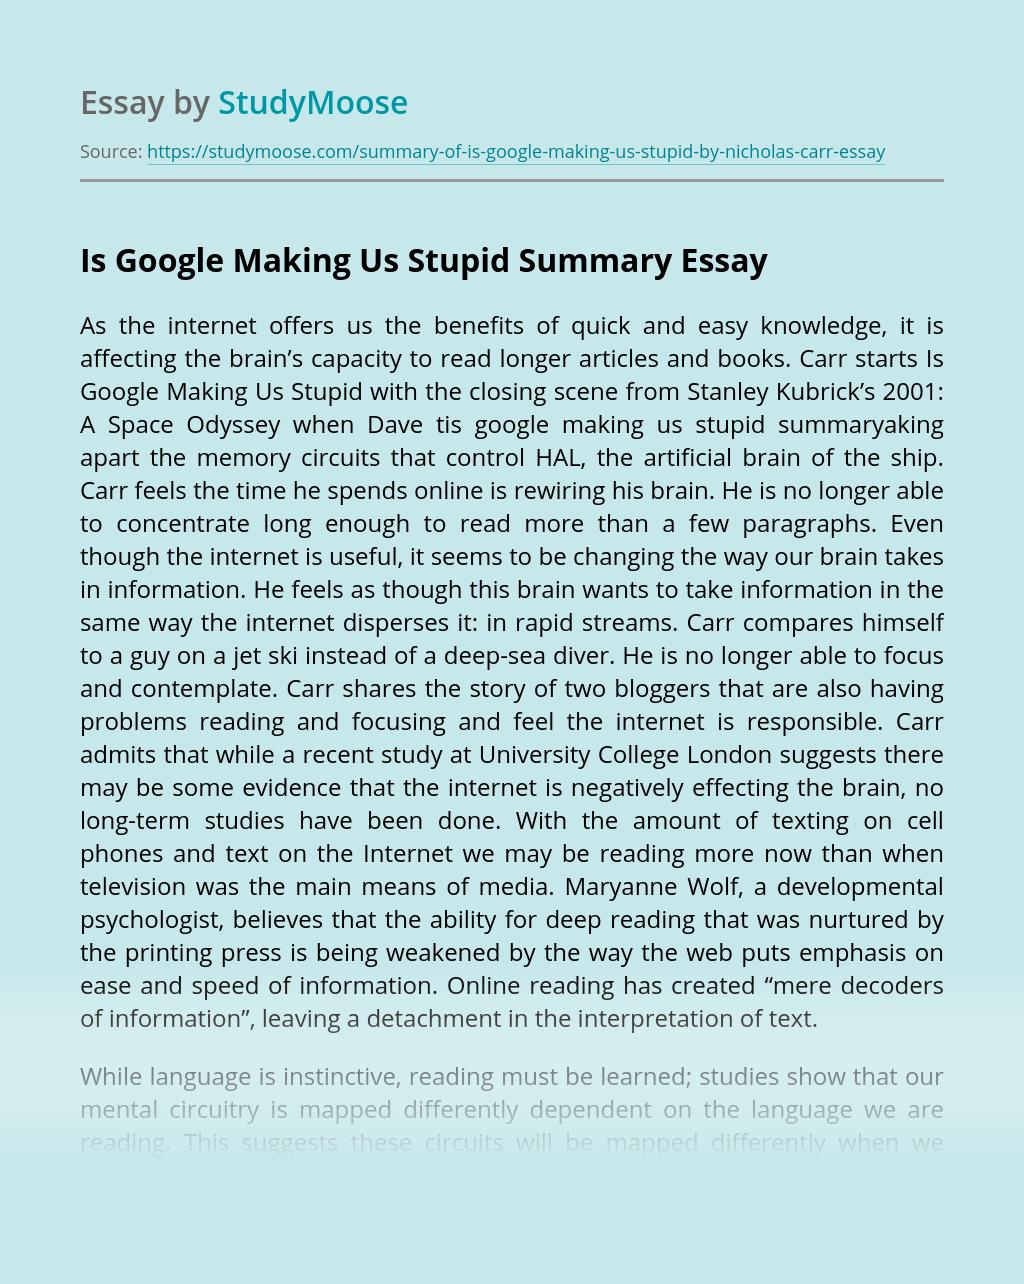 Is Google Making Us Stupid, Summary by Nicholas Carr